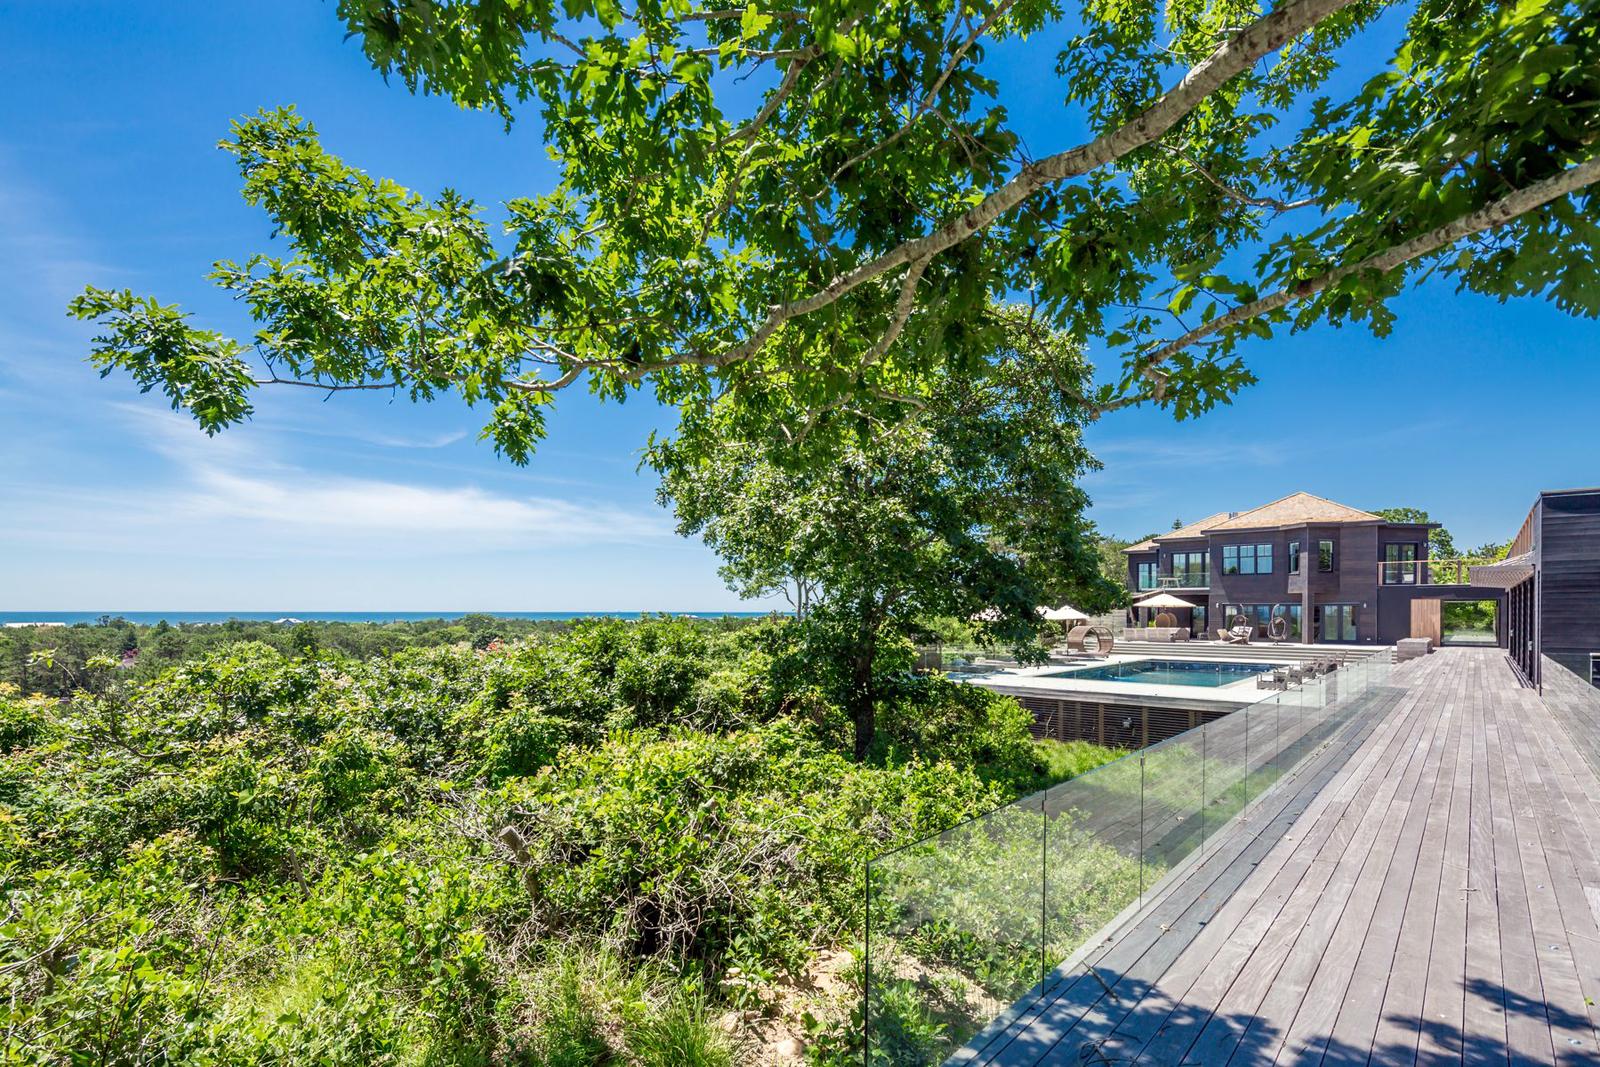 23-res4-resolution-4-architecture-modern-modular-house-prefab-amagansett-addition-exterior-view.jpg